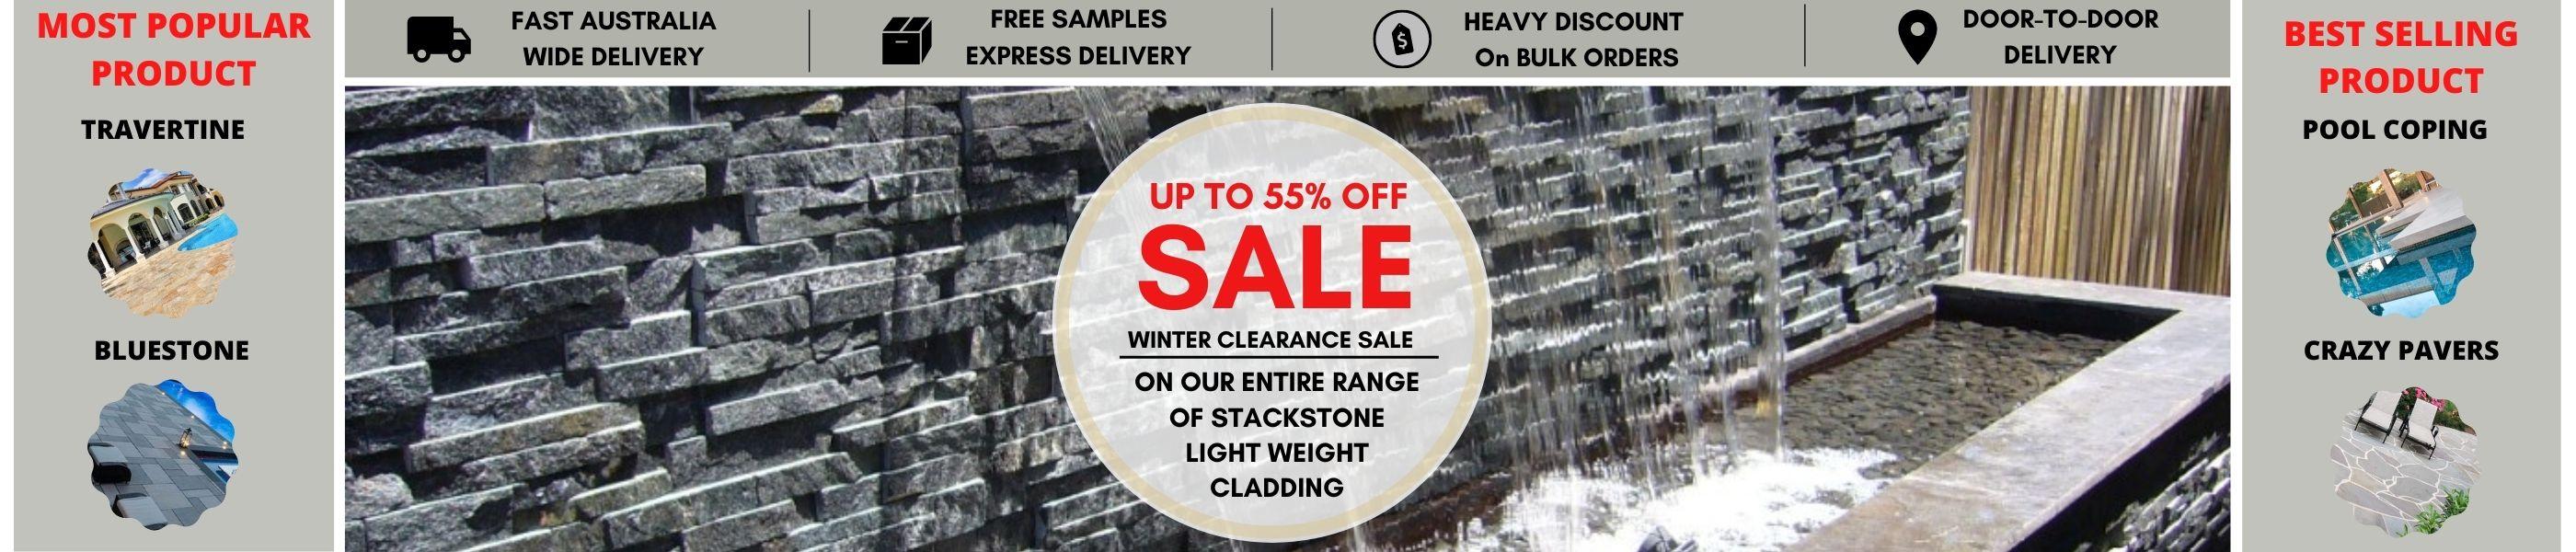 Stack Stone Light Weight Cladding